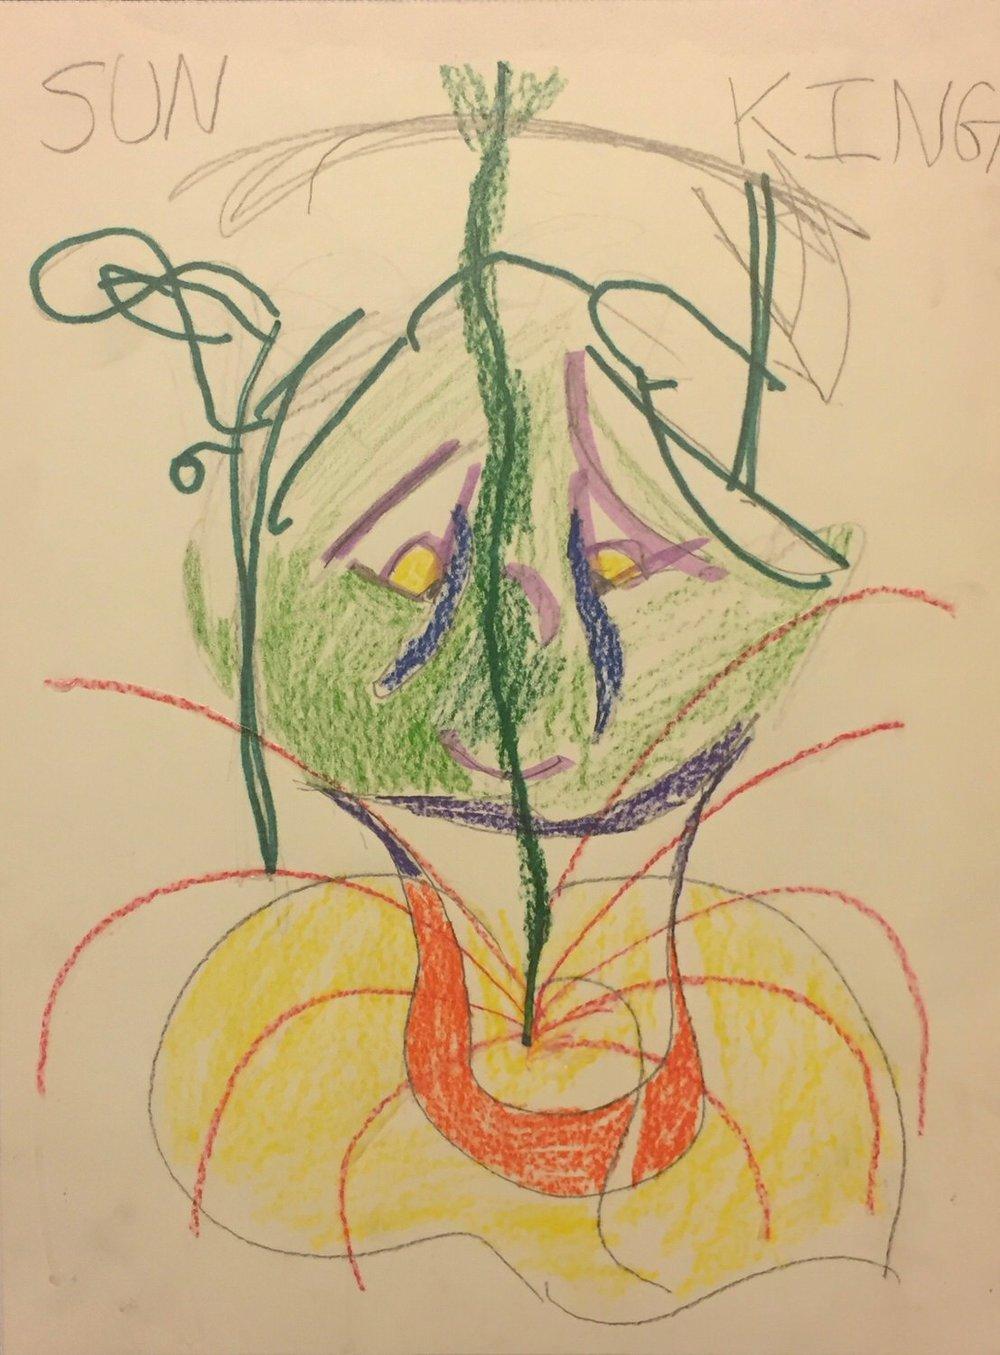 2015.??.?? - Faces (Sun King).jpg